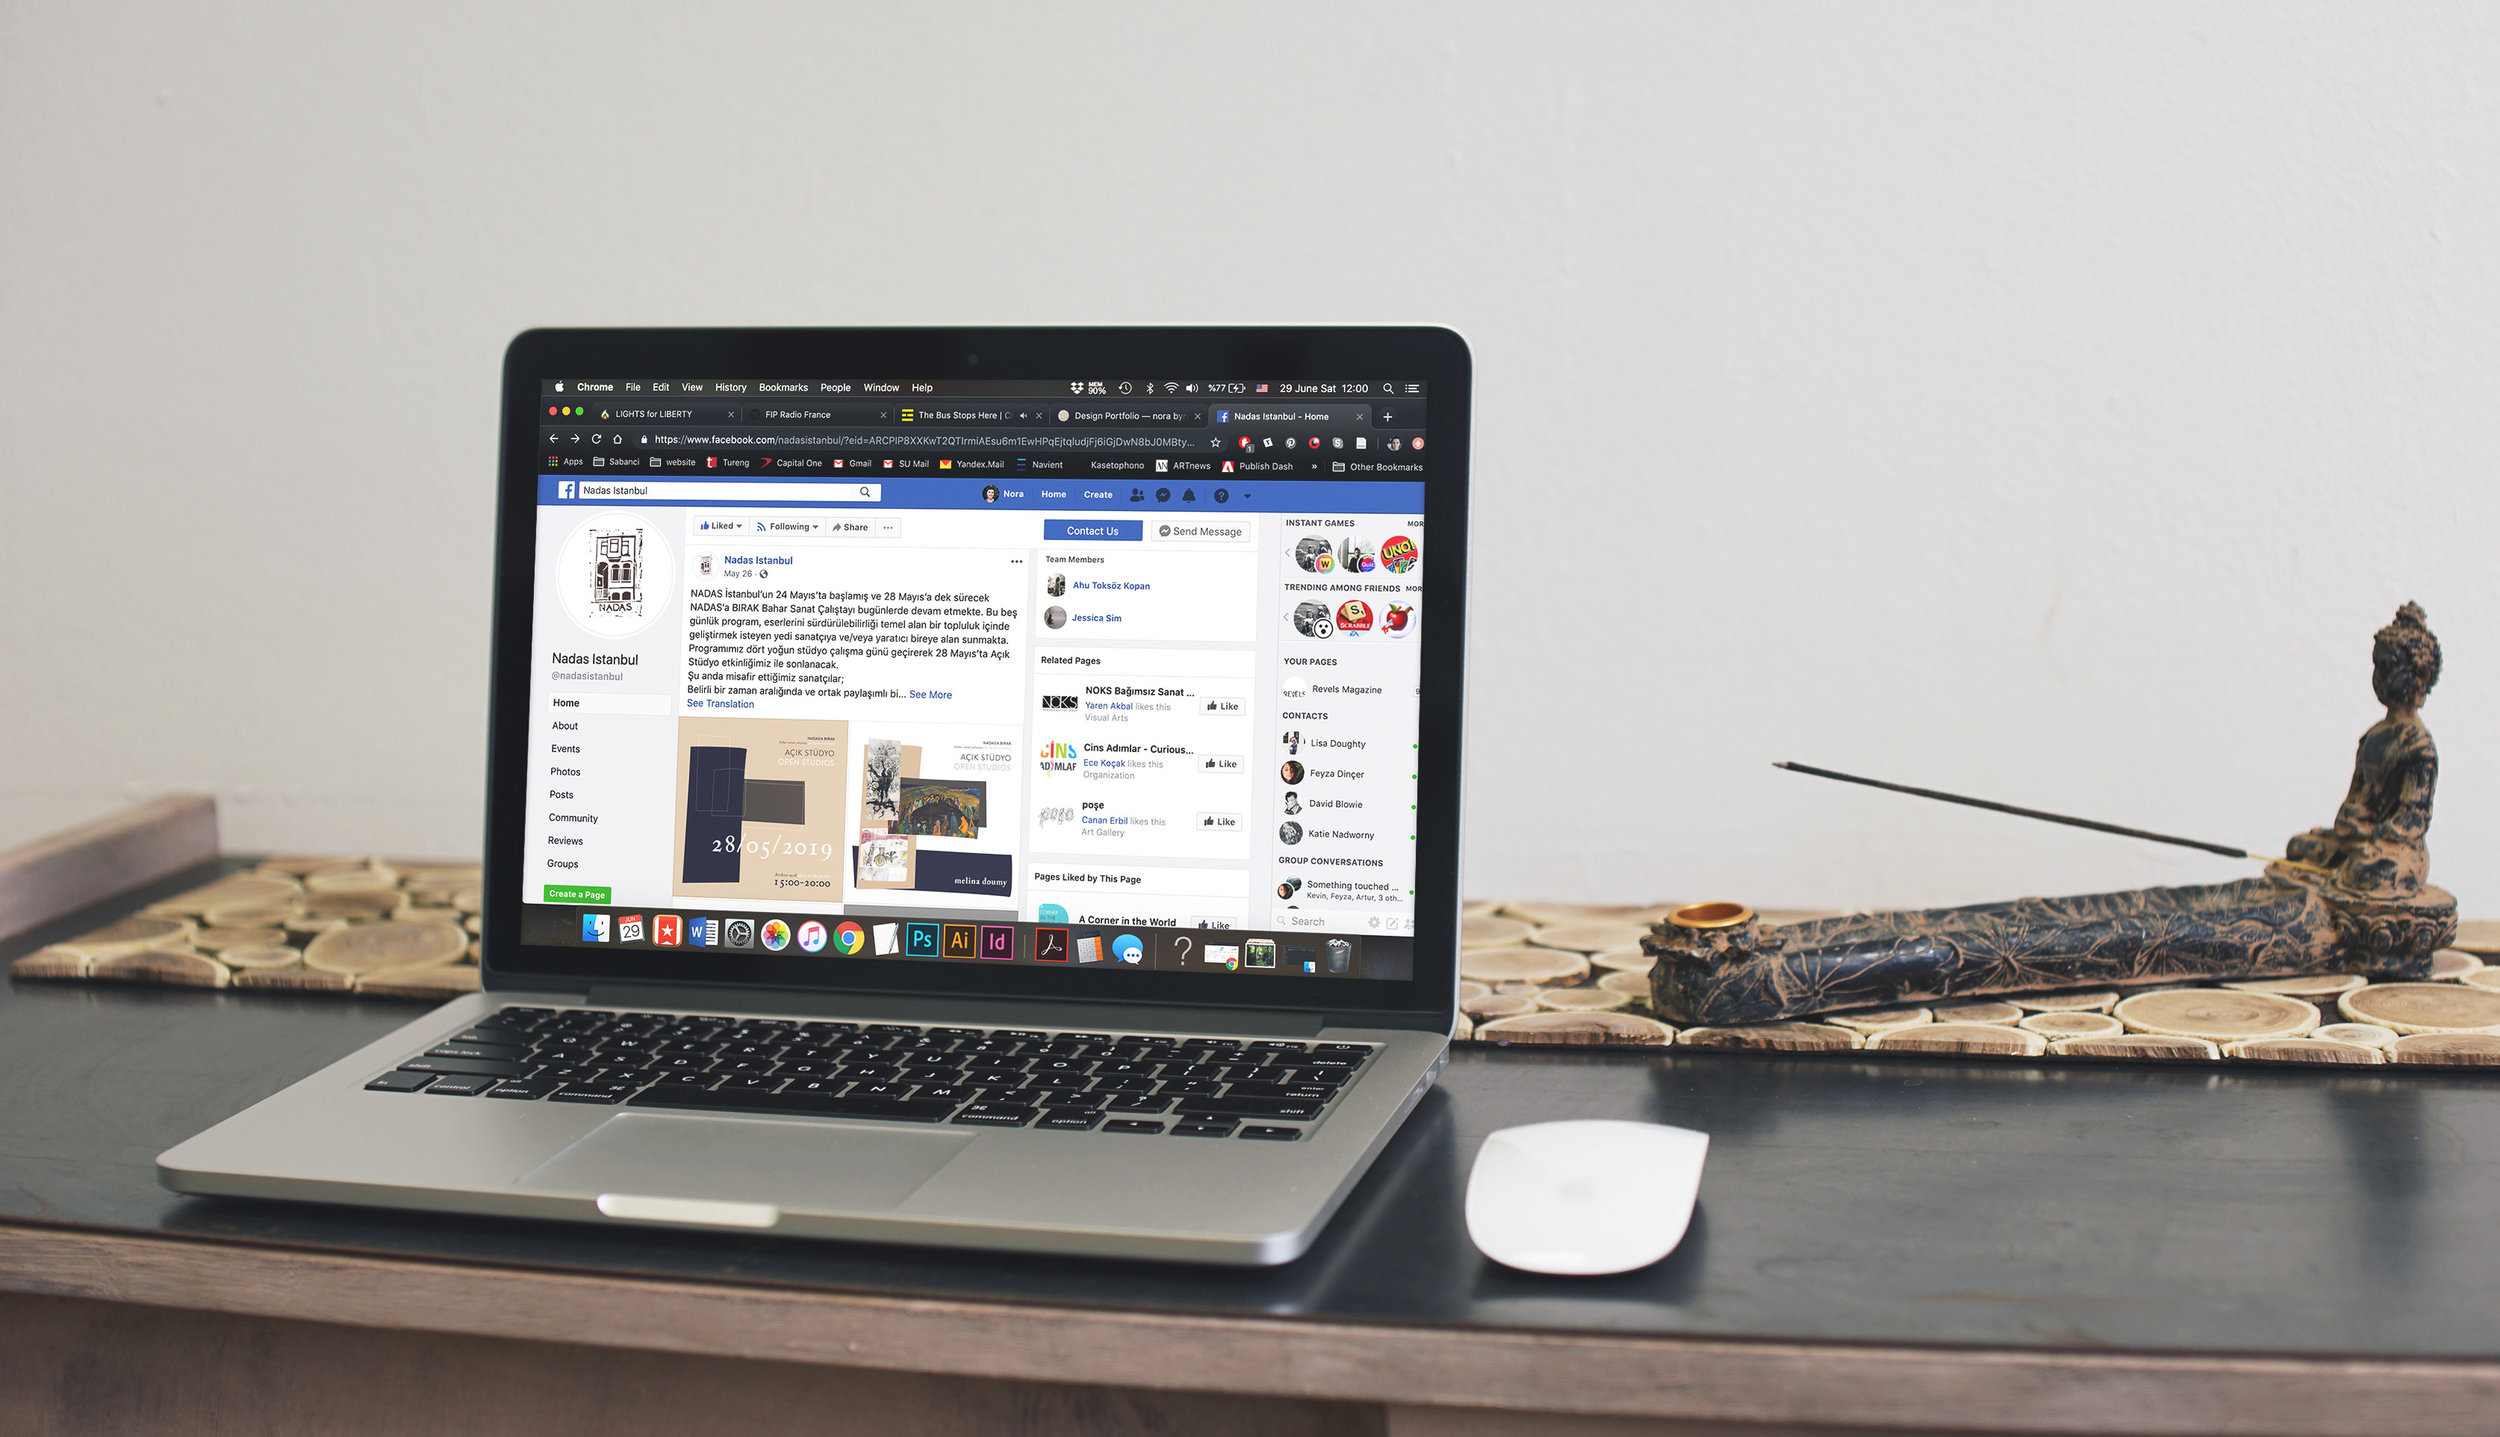 laptop mockup promos.jpg